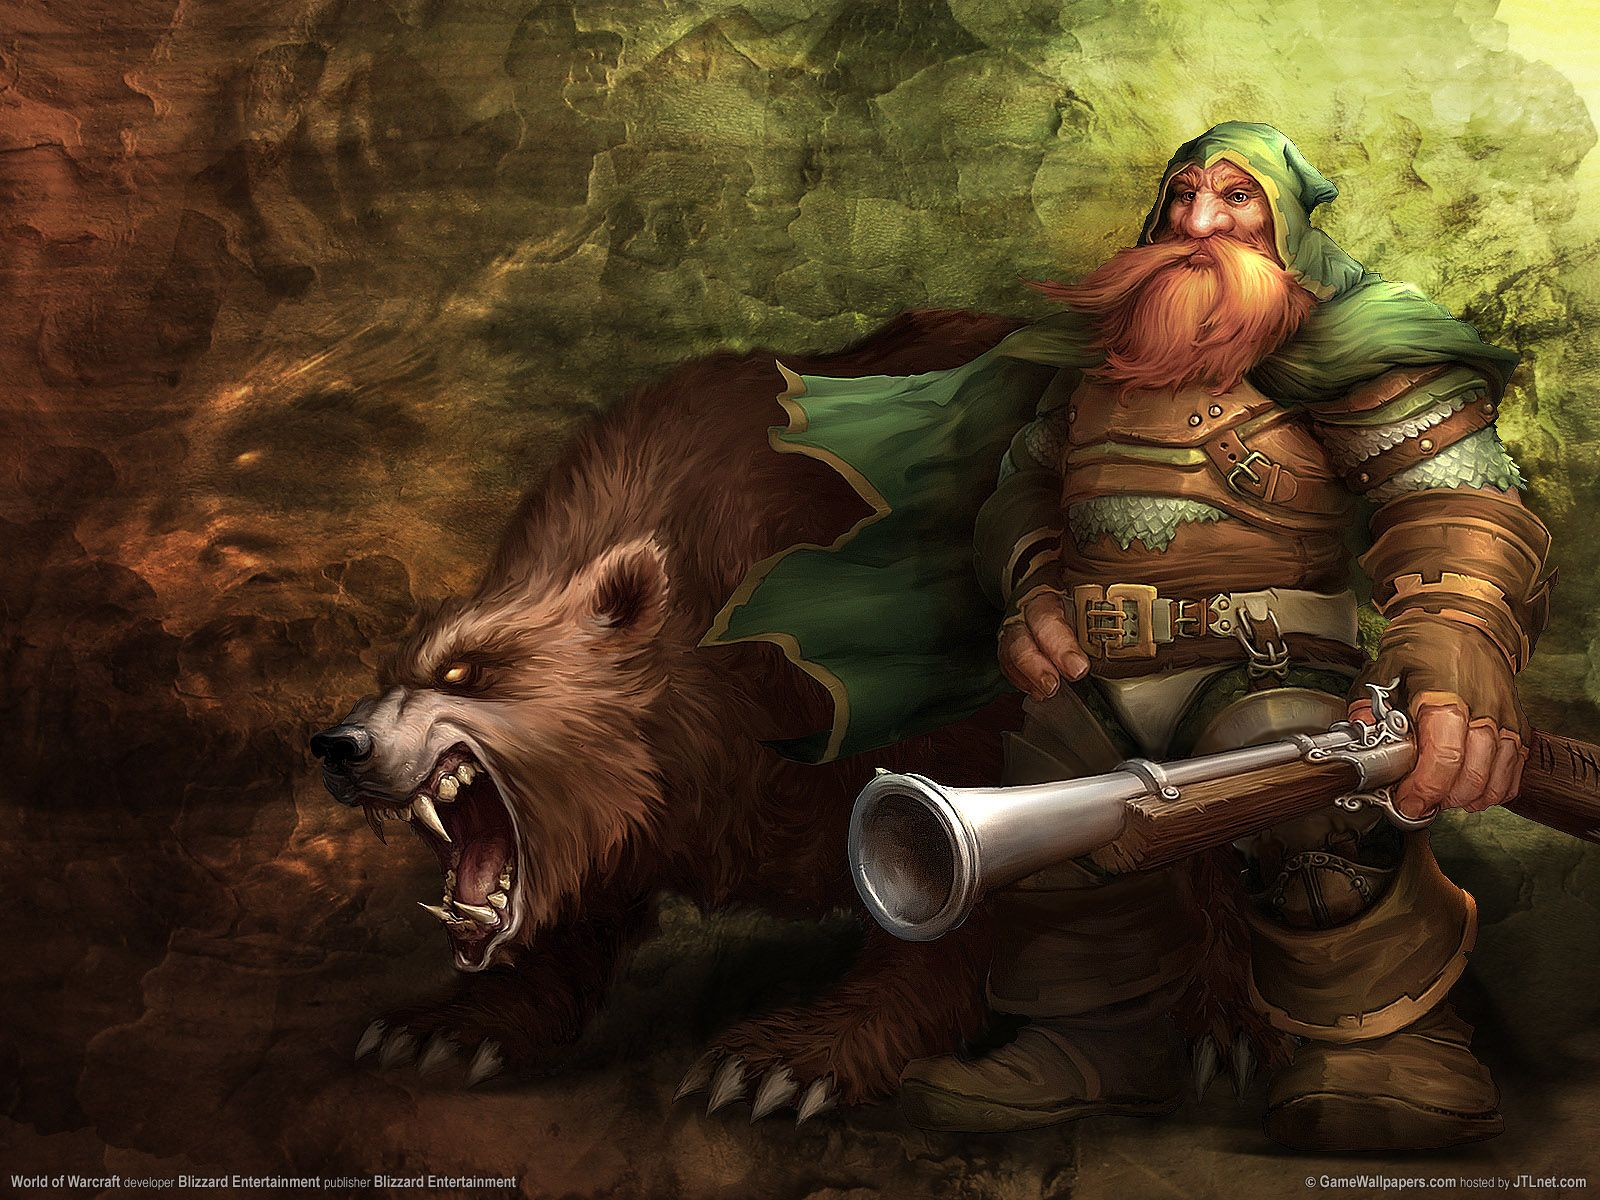 World Of Warcraft Wallpaper 3 252393 World Of Warcraft Wallpaper World Of Warcraft World Of Warcraft Game